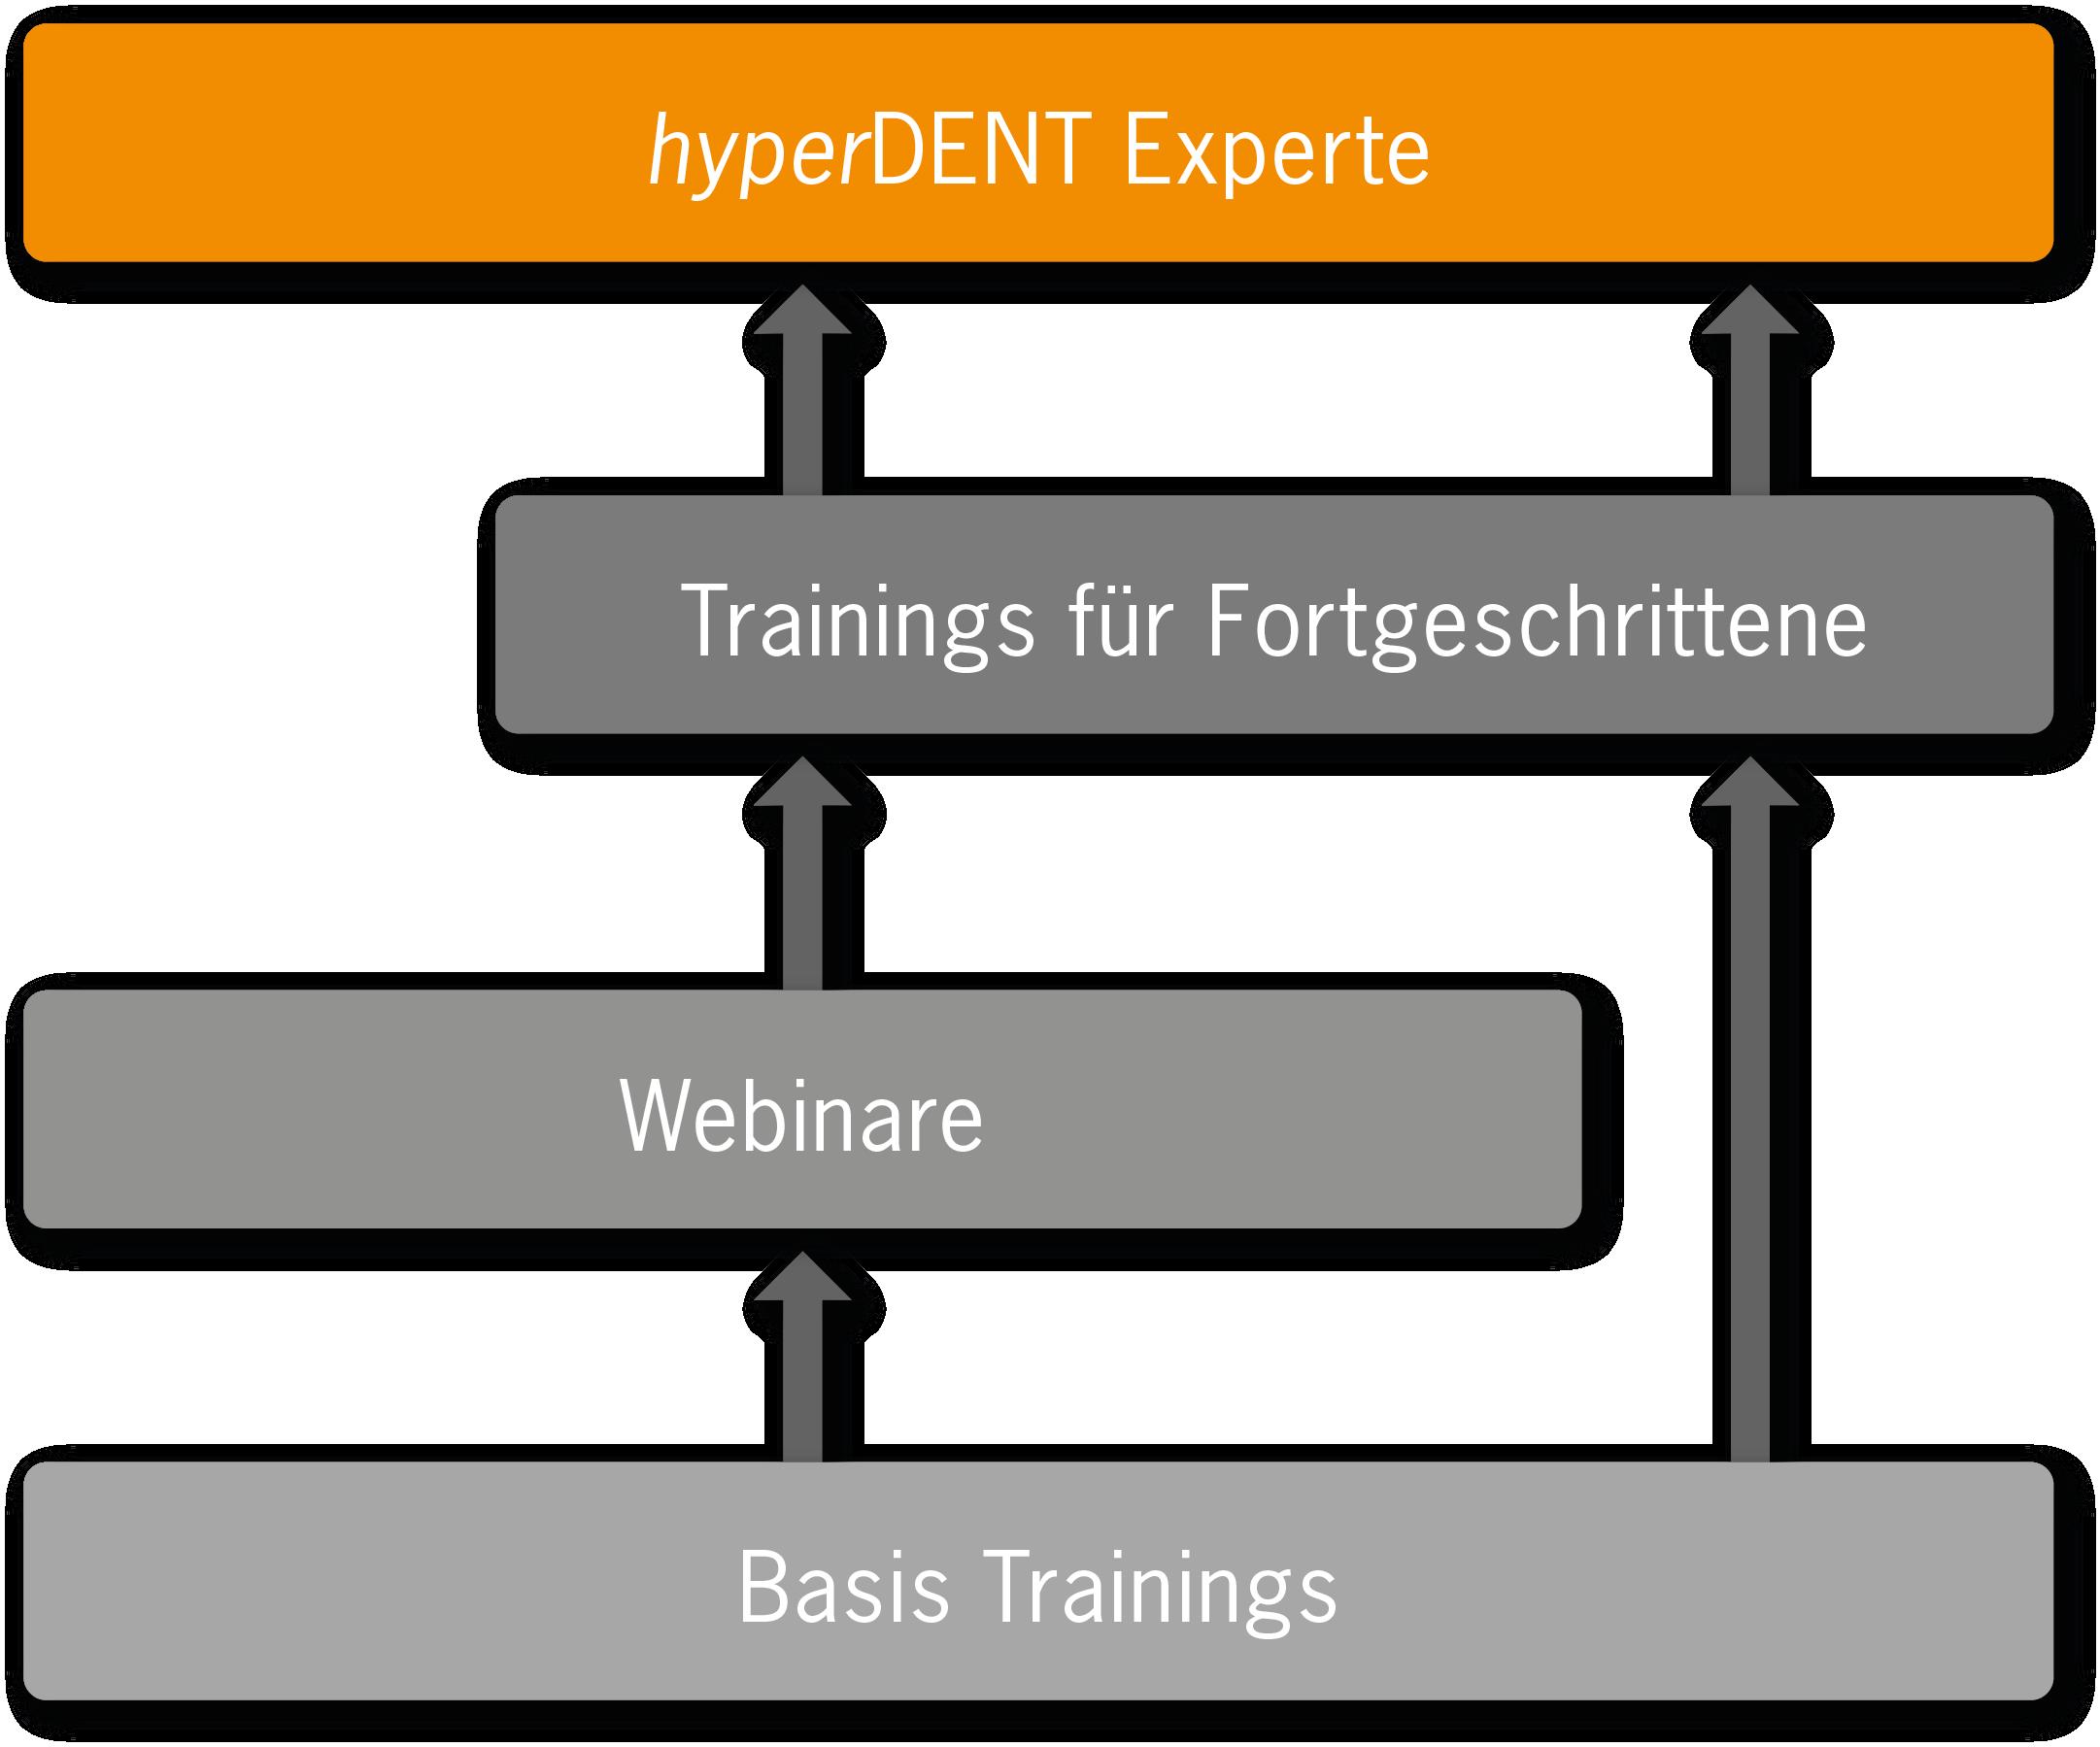 hyperDENT trainings diagram DE